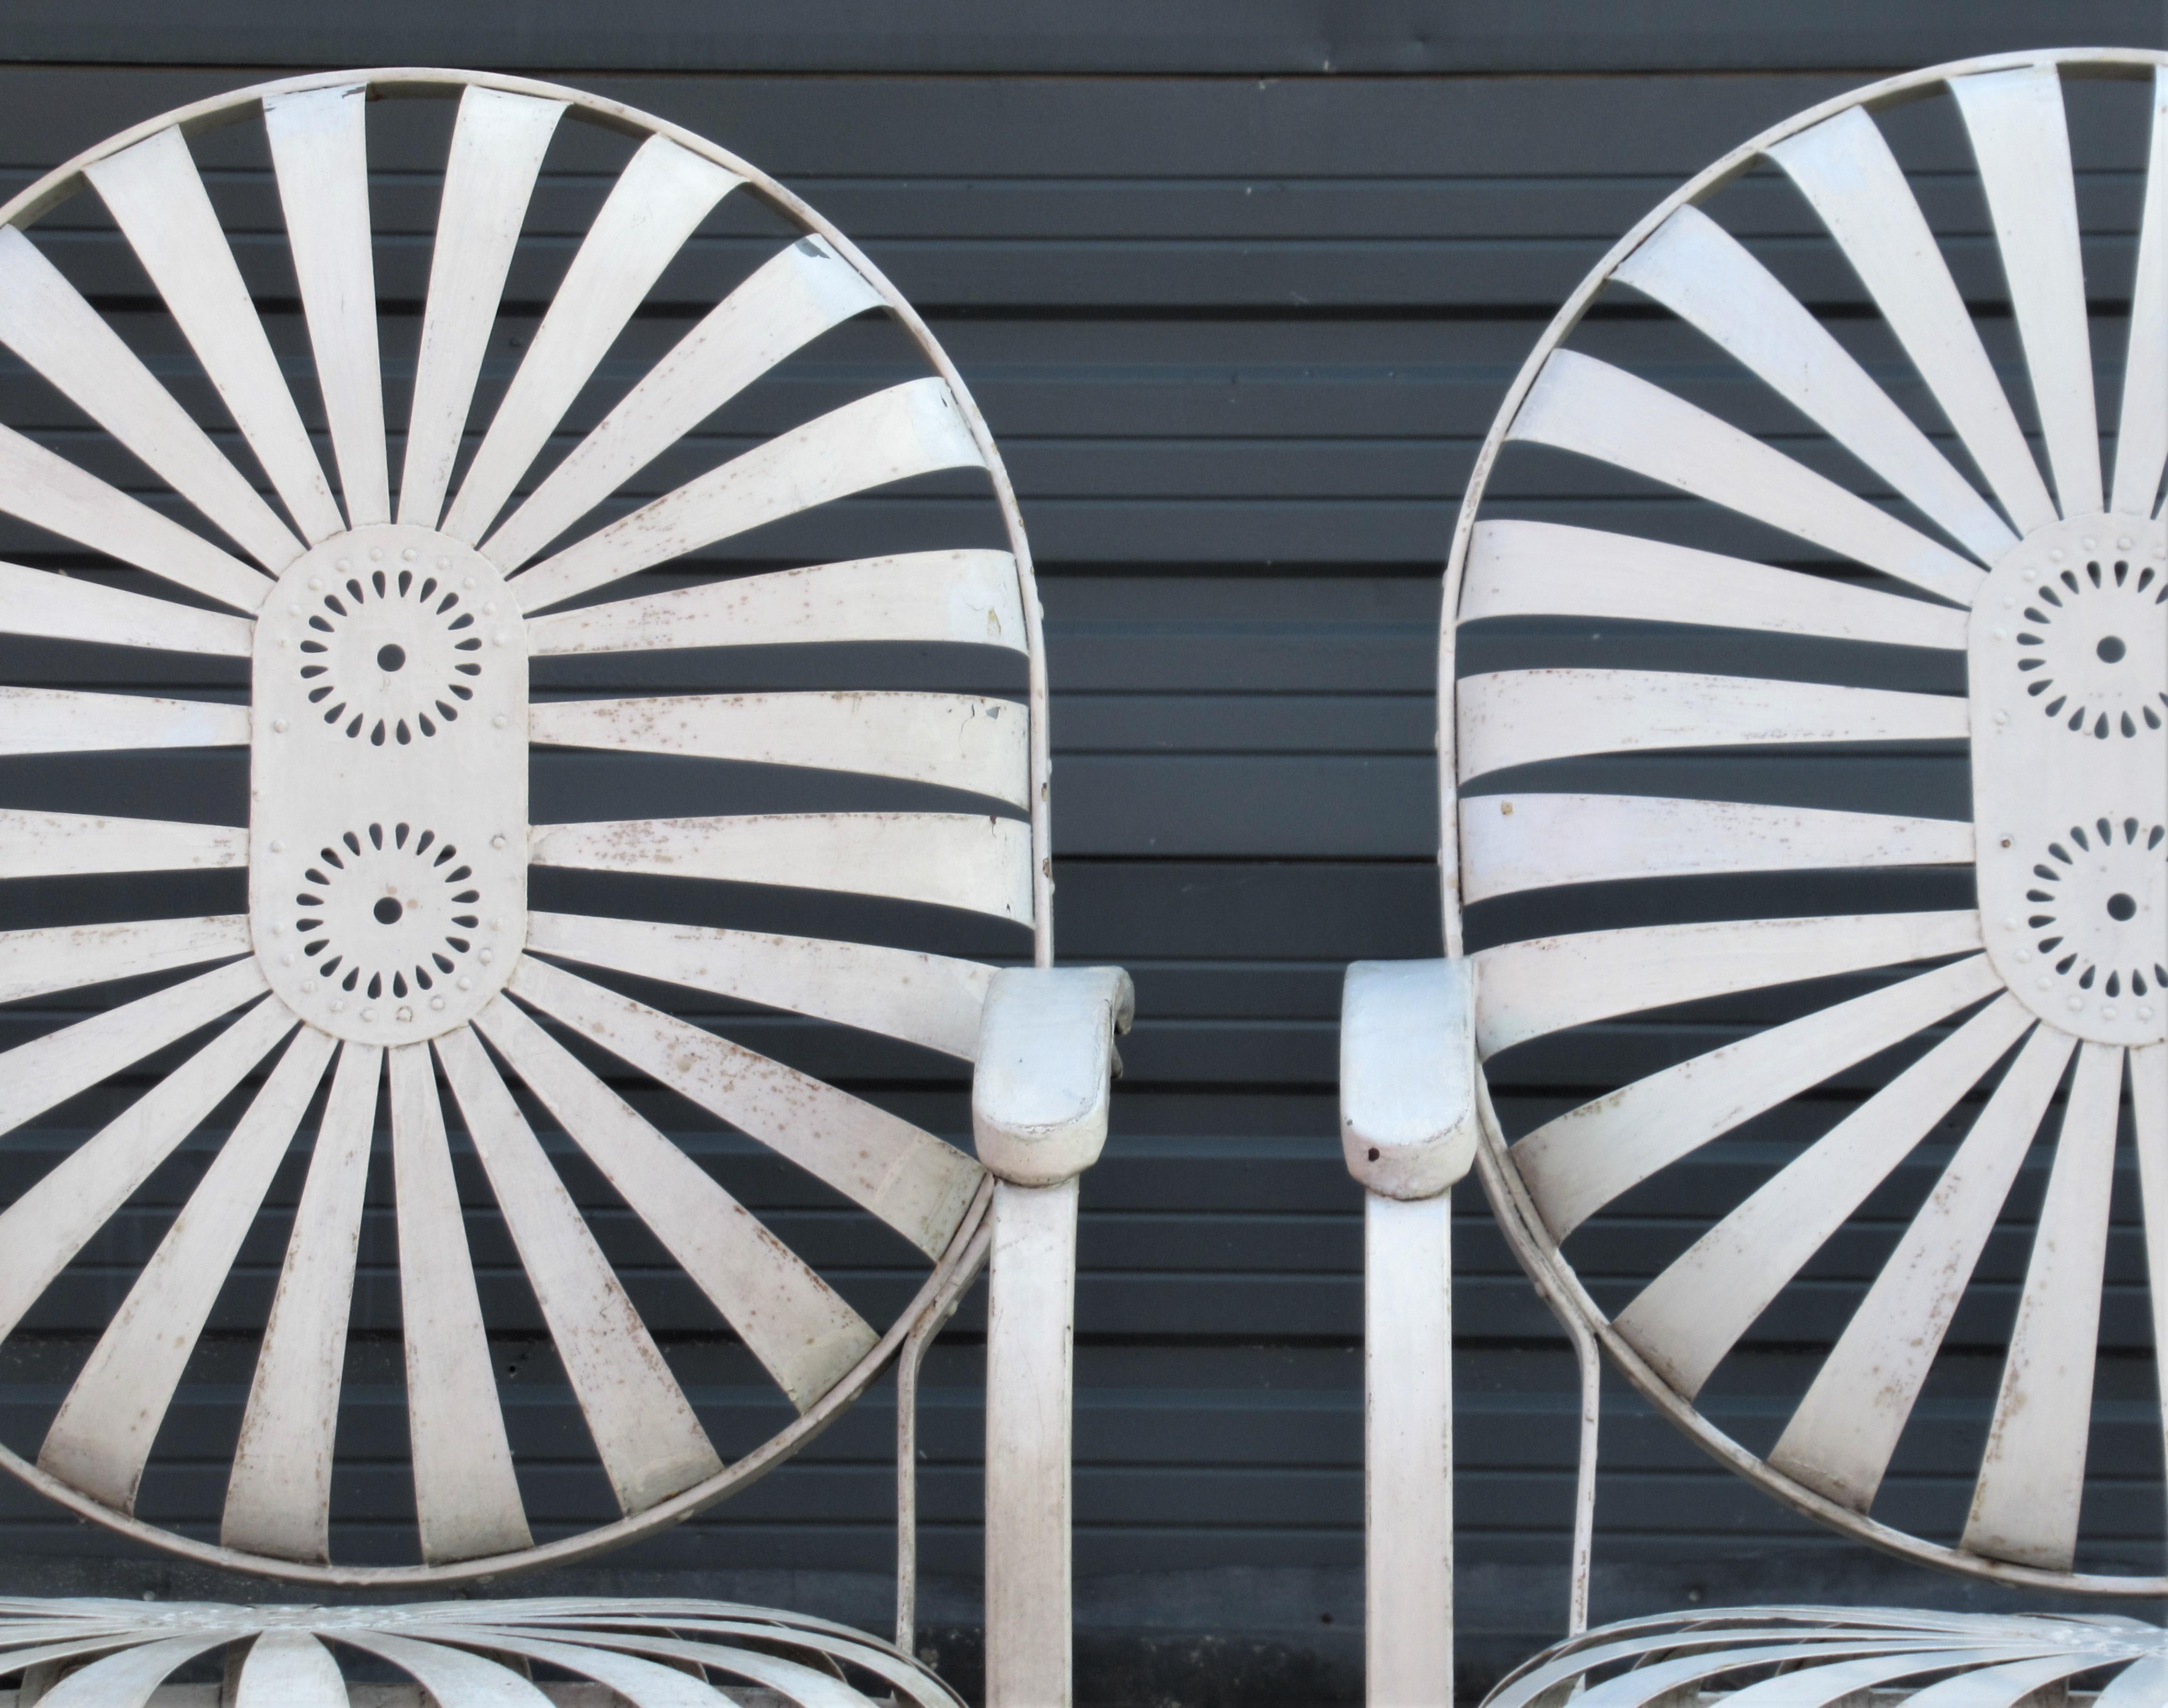 New Spokes Carre Chair Slats Sunburst Pinwheel chair